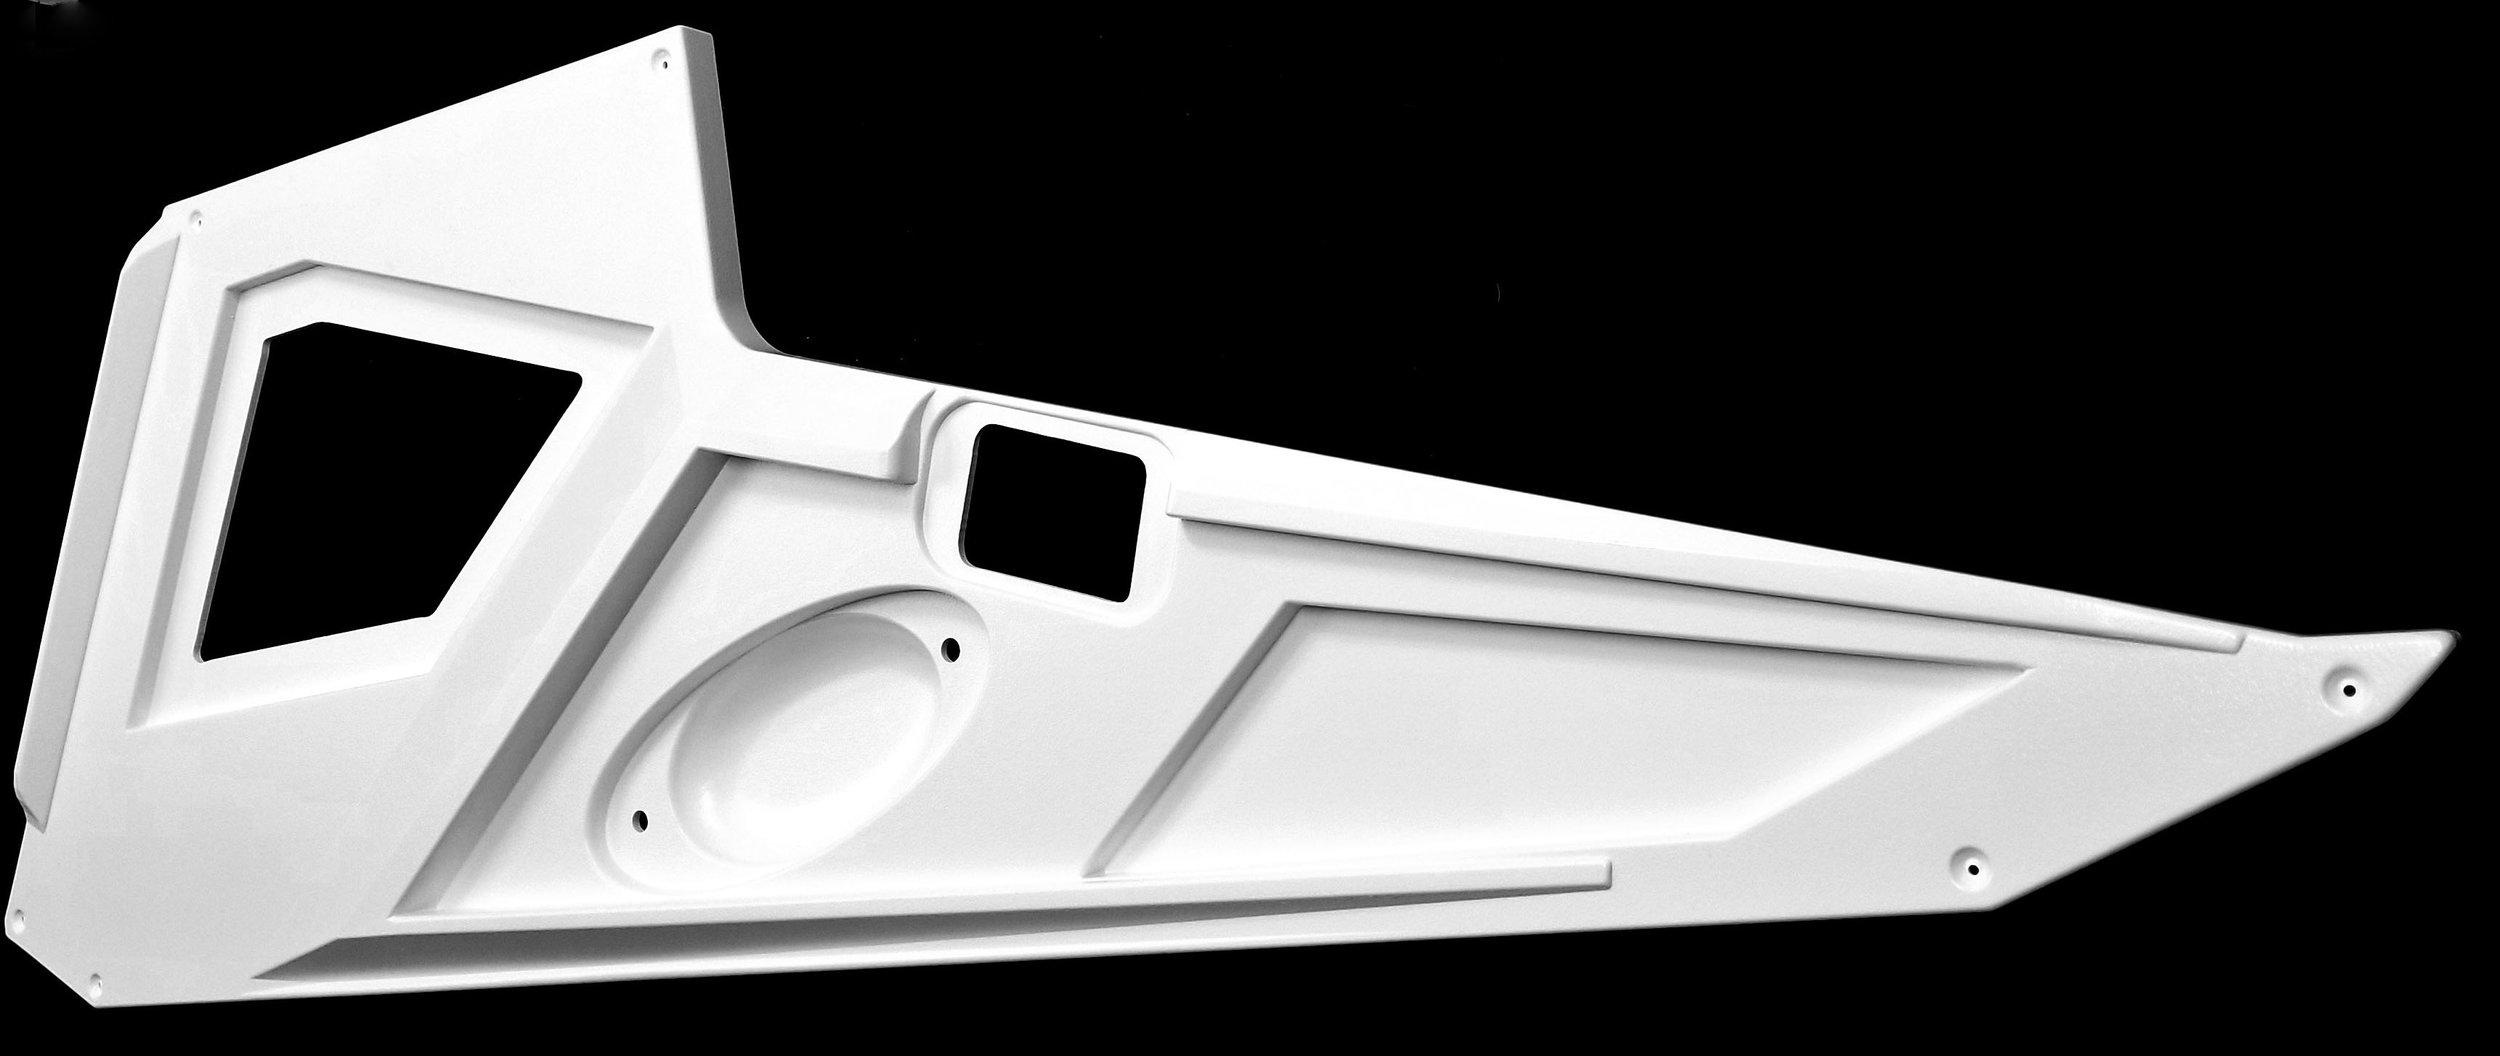 Pressure Thermoforming - Sharper crisper edges, more detail, multi-pattern mold texture, improved tolerancesDecorative side panels for bass boat manufacturer